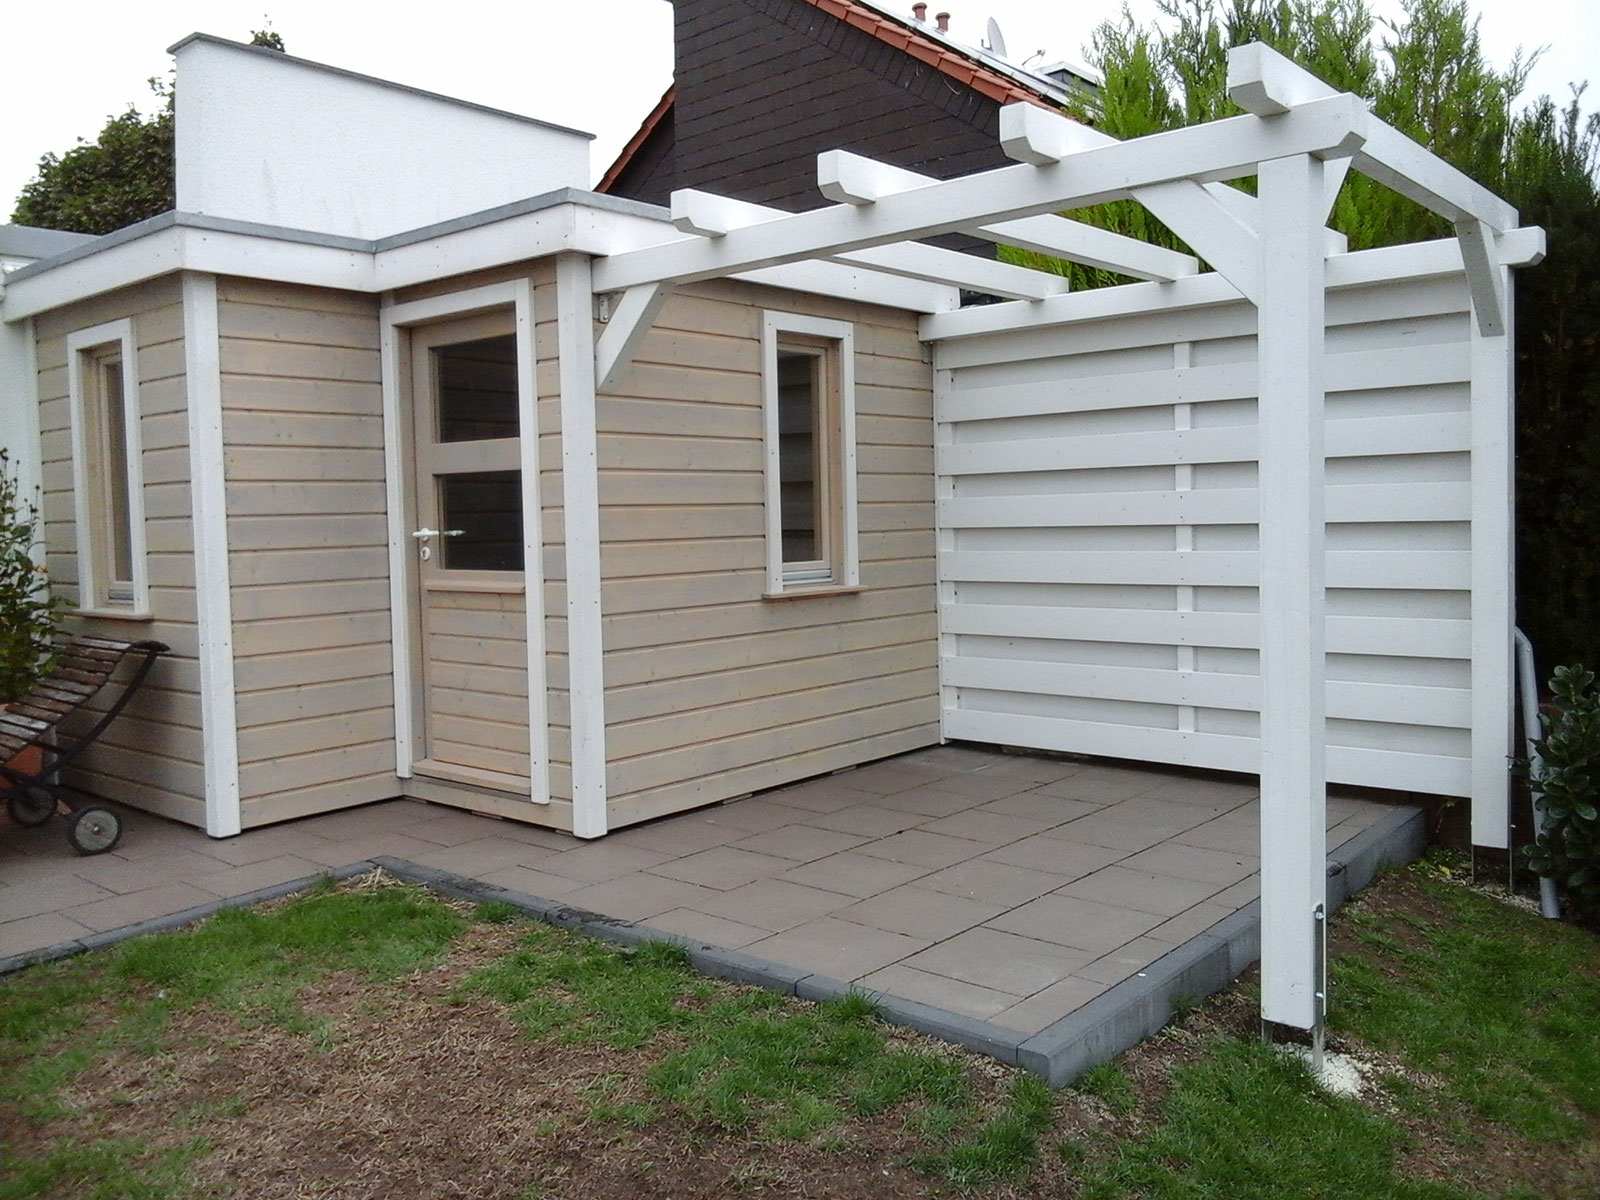 keilholzbau - gartenhaus